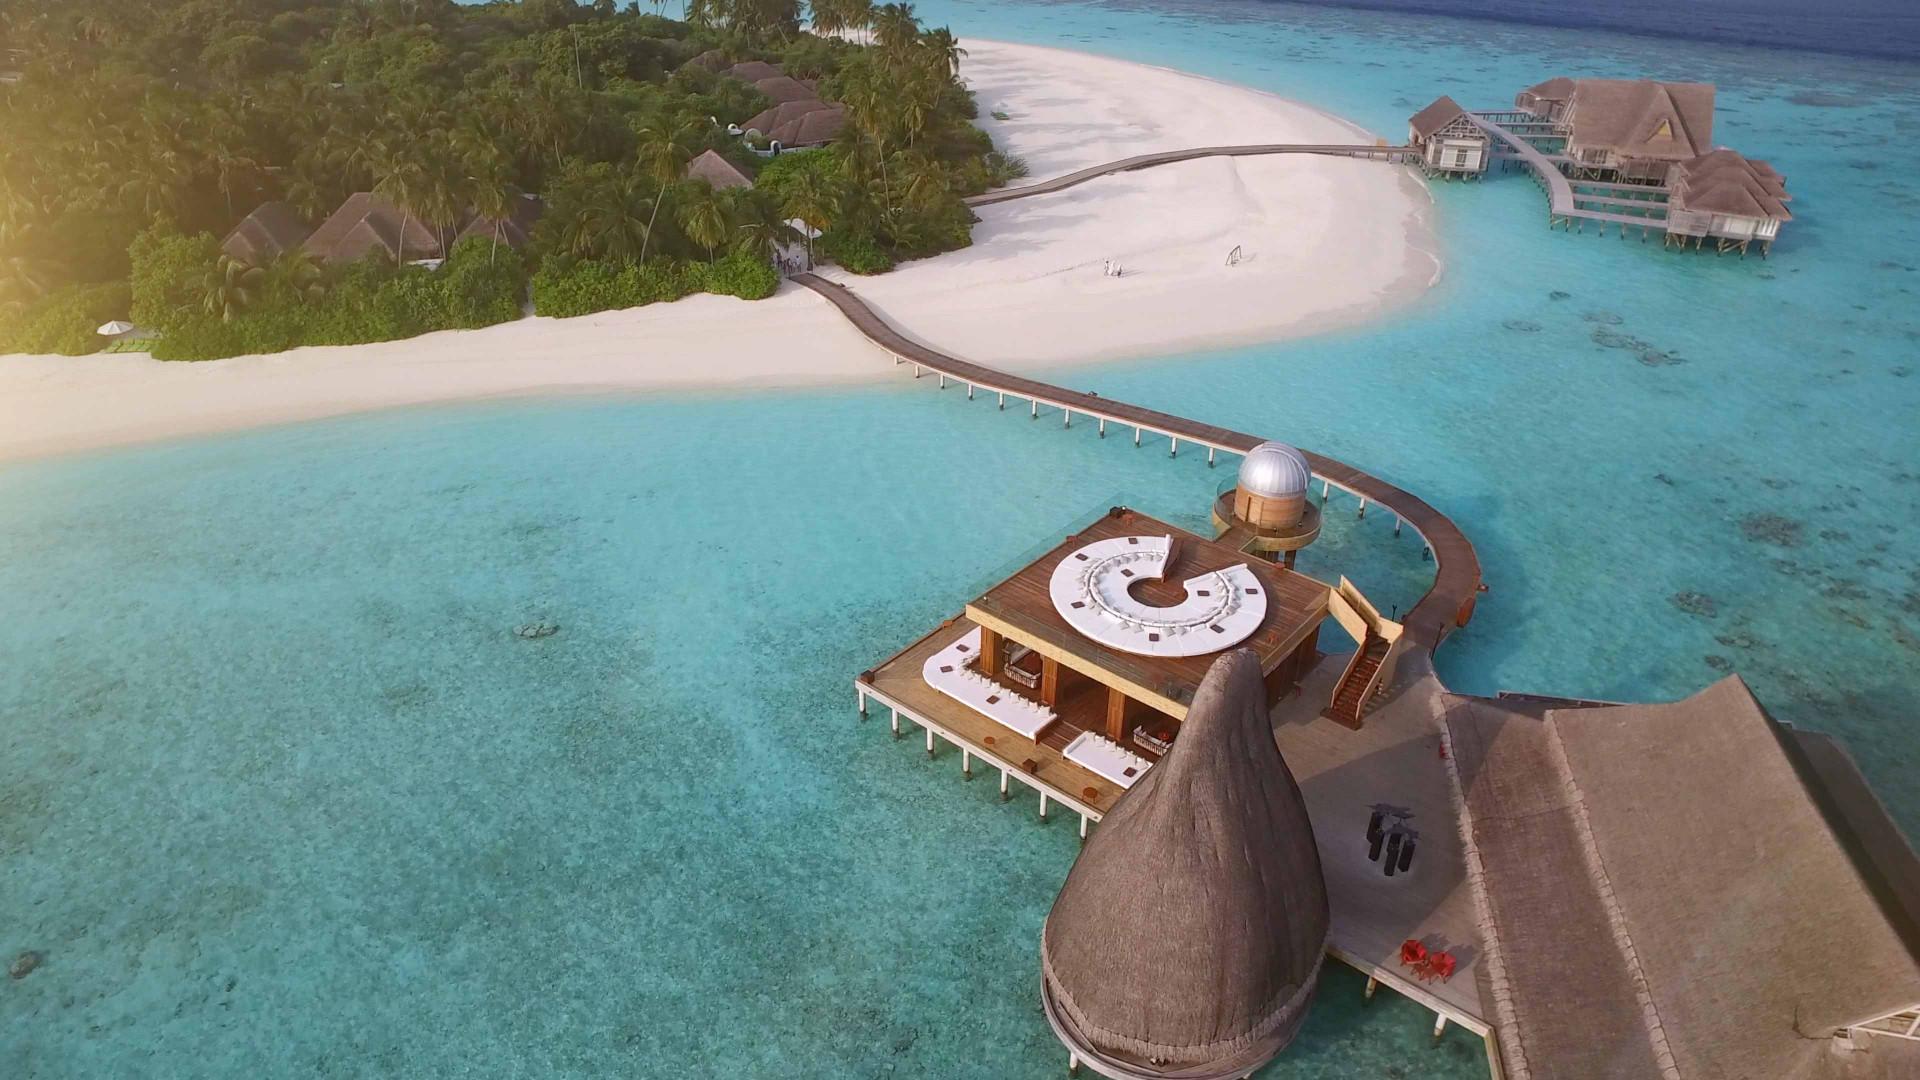 Stargazing in the Maldives